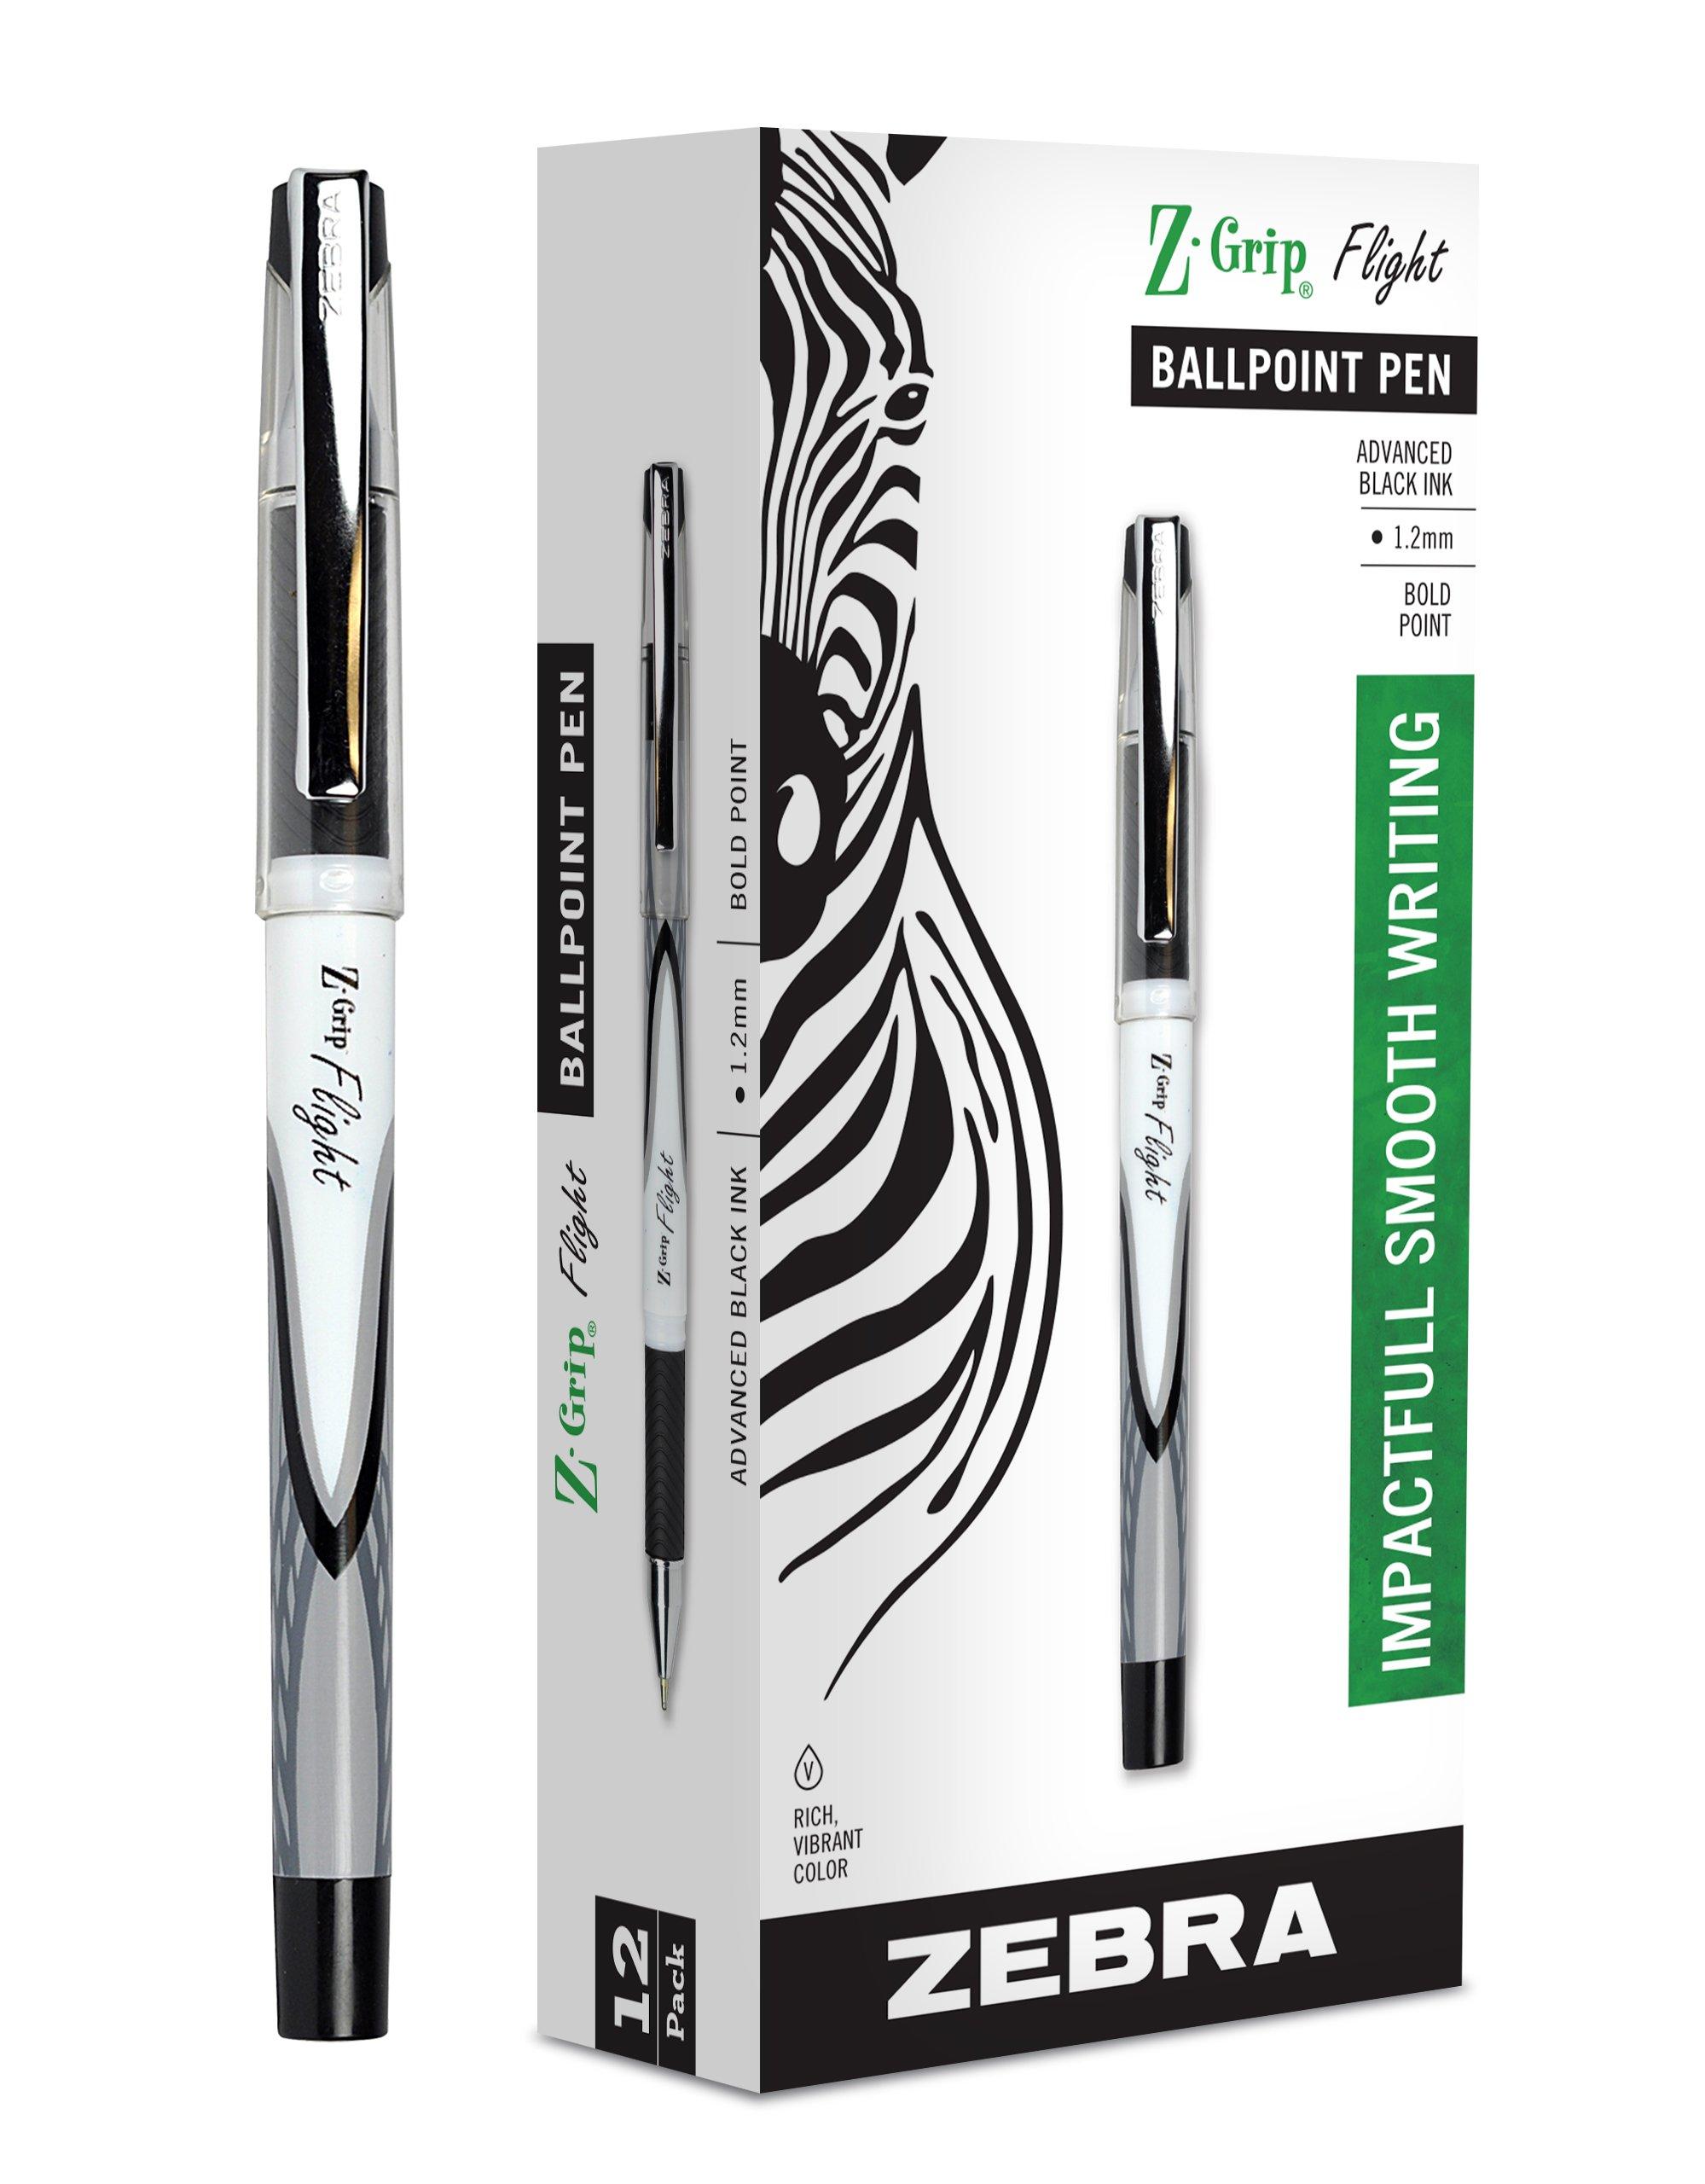 12 x Zebra Pen Z-Grip Flight Stick Ballpoint Pen, Bold Point